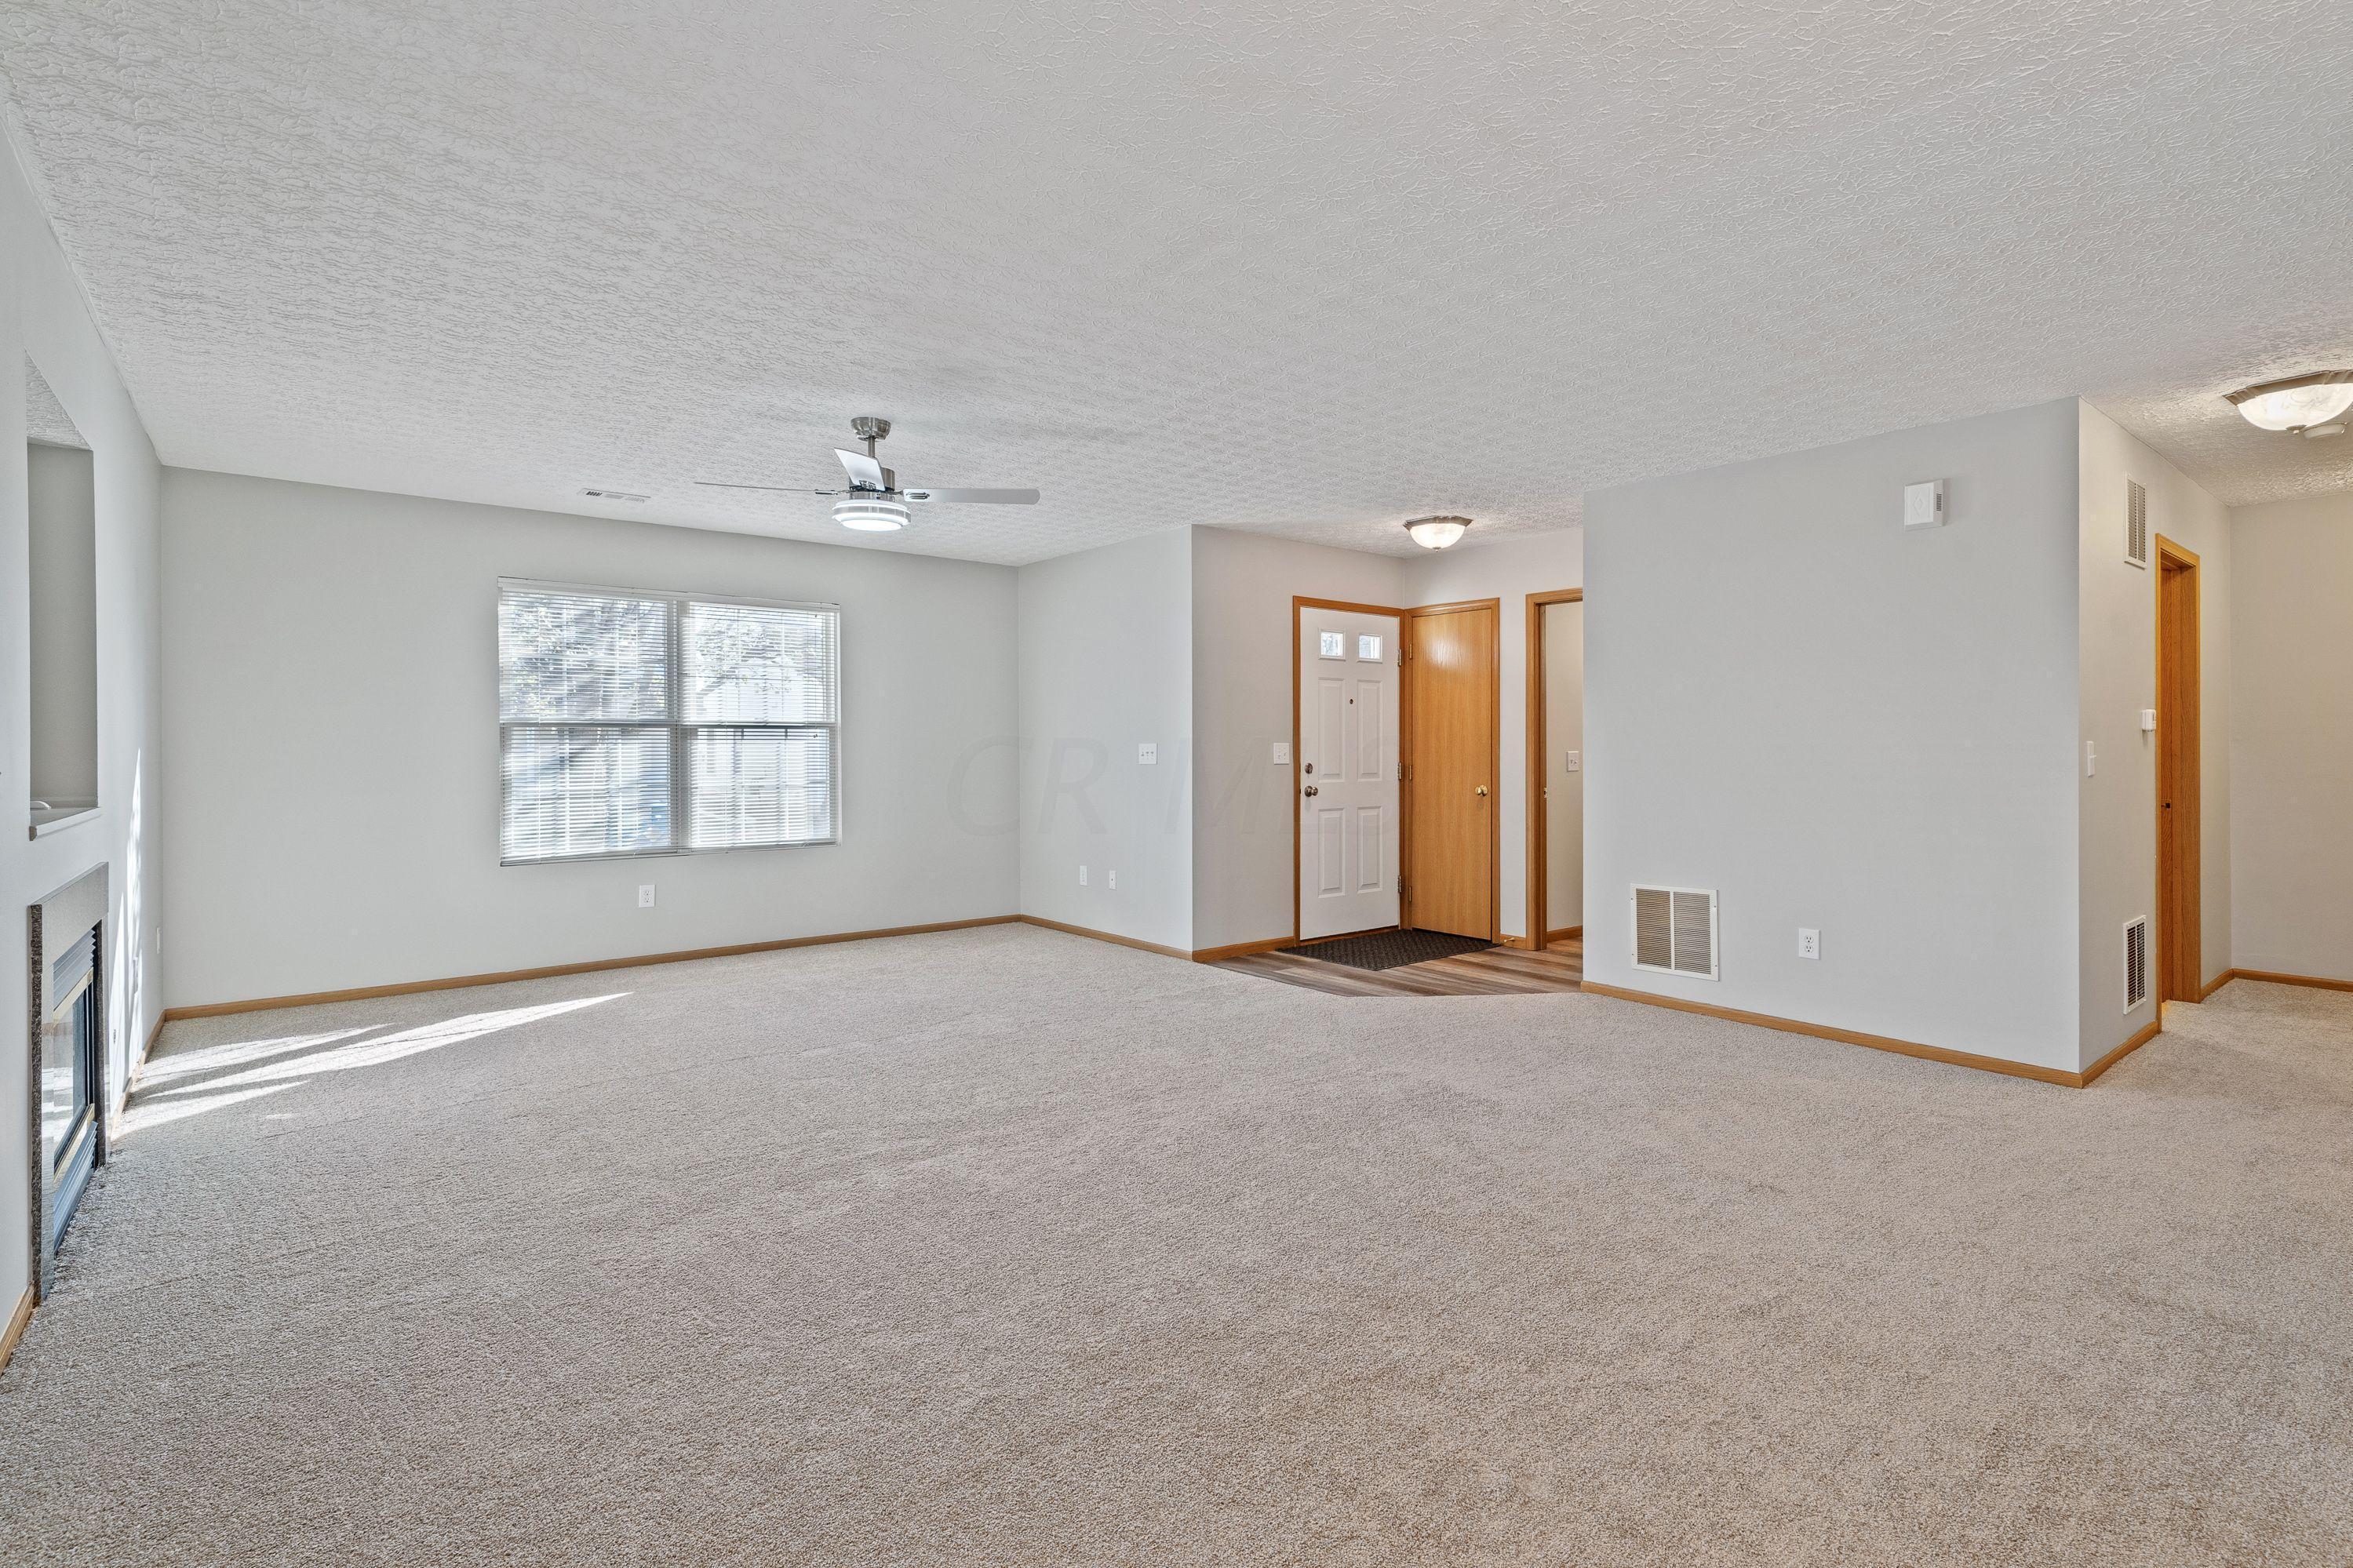 8291 Tegmen Street, Columbus, Ohio 43240, 3 Bedrooms Bedrooms, ,3 BathroomsBathrooms,Residential,For Sale,Tegmen,220040574